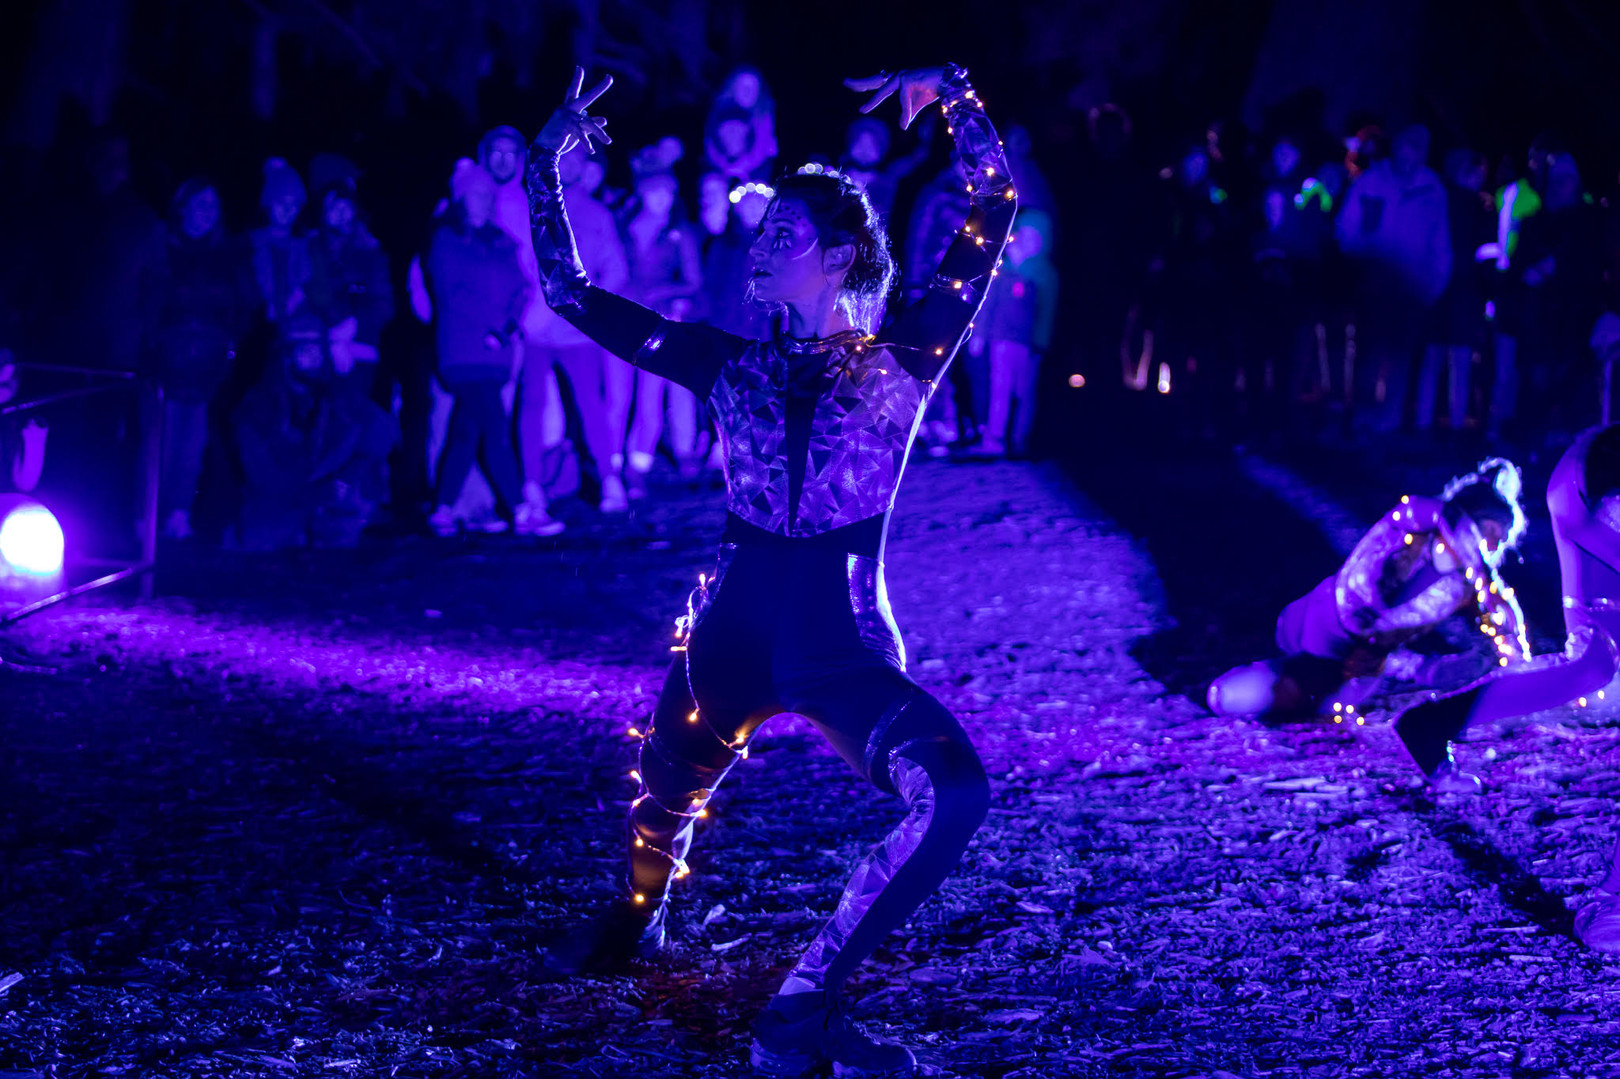 Stag dance.jpg